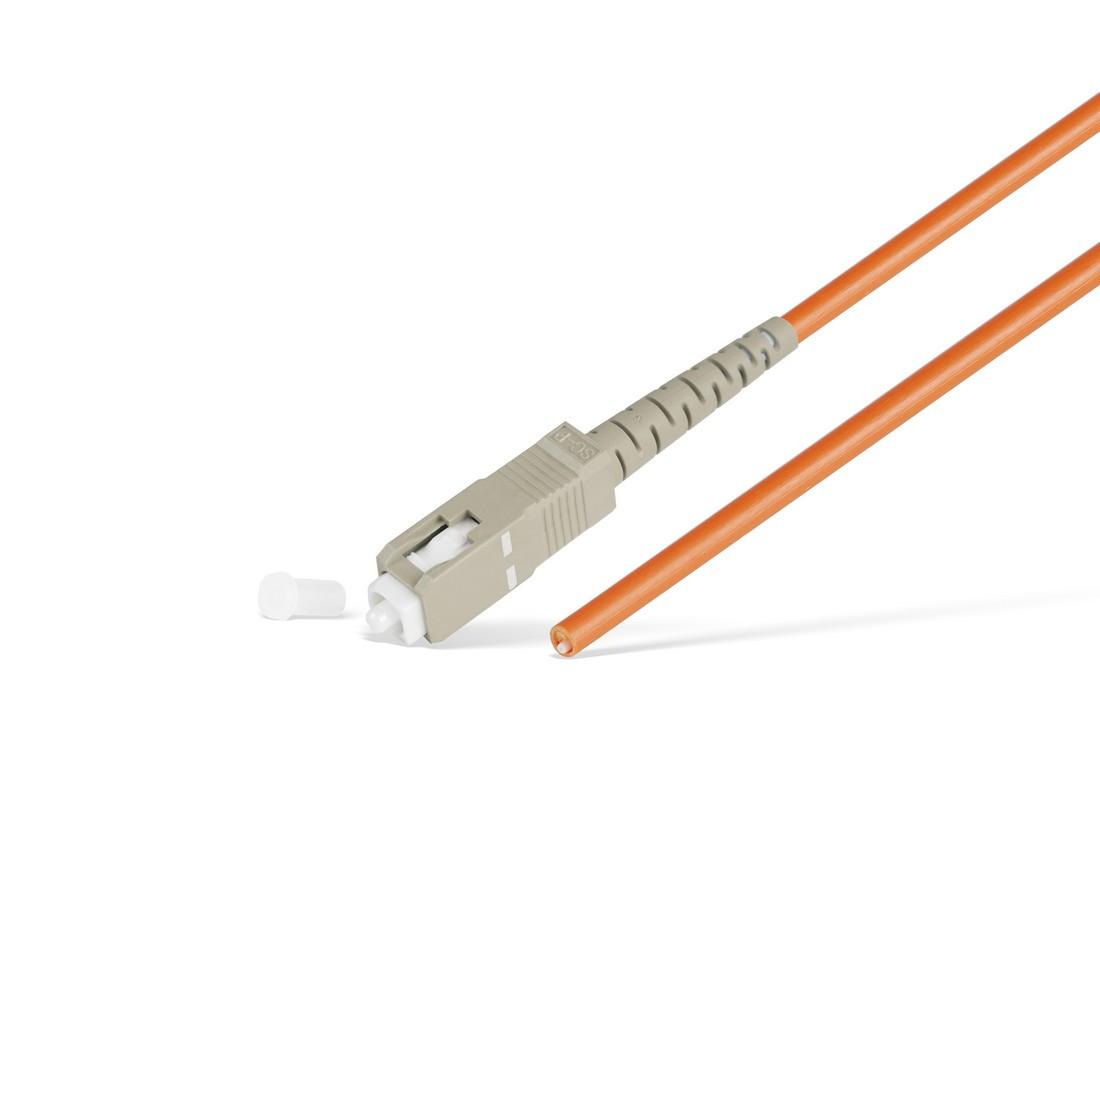 Пигтейл Оптический SC/UPC MM OM1 62.5/125 3.0мм 1 м